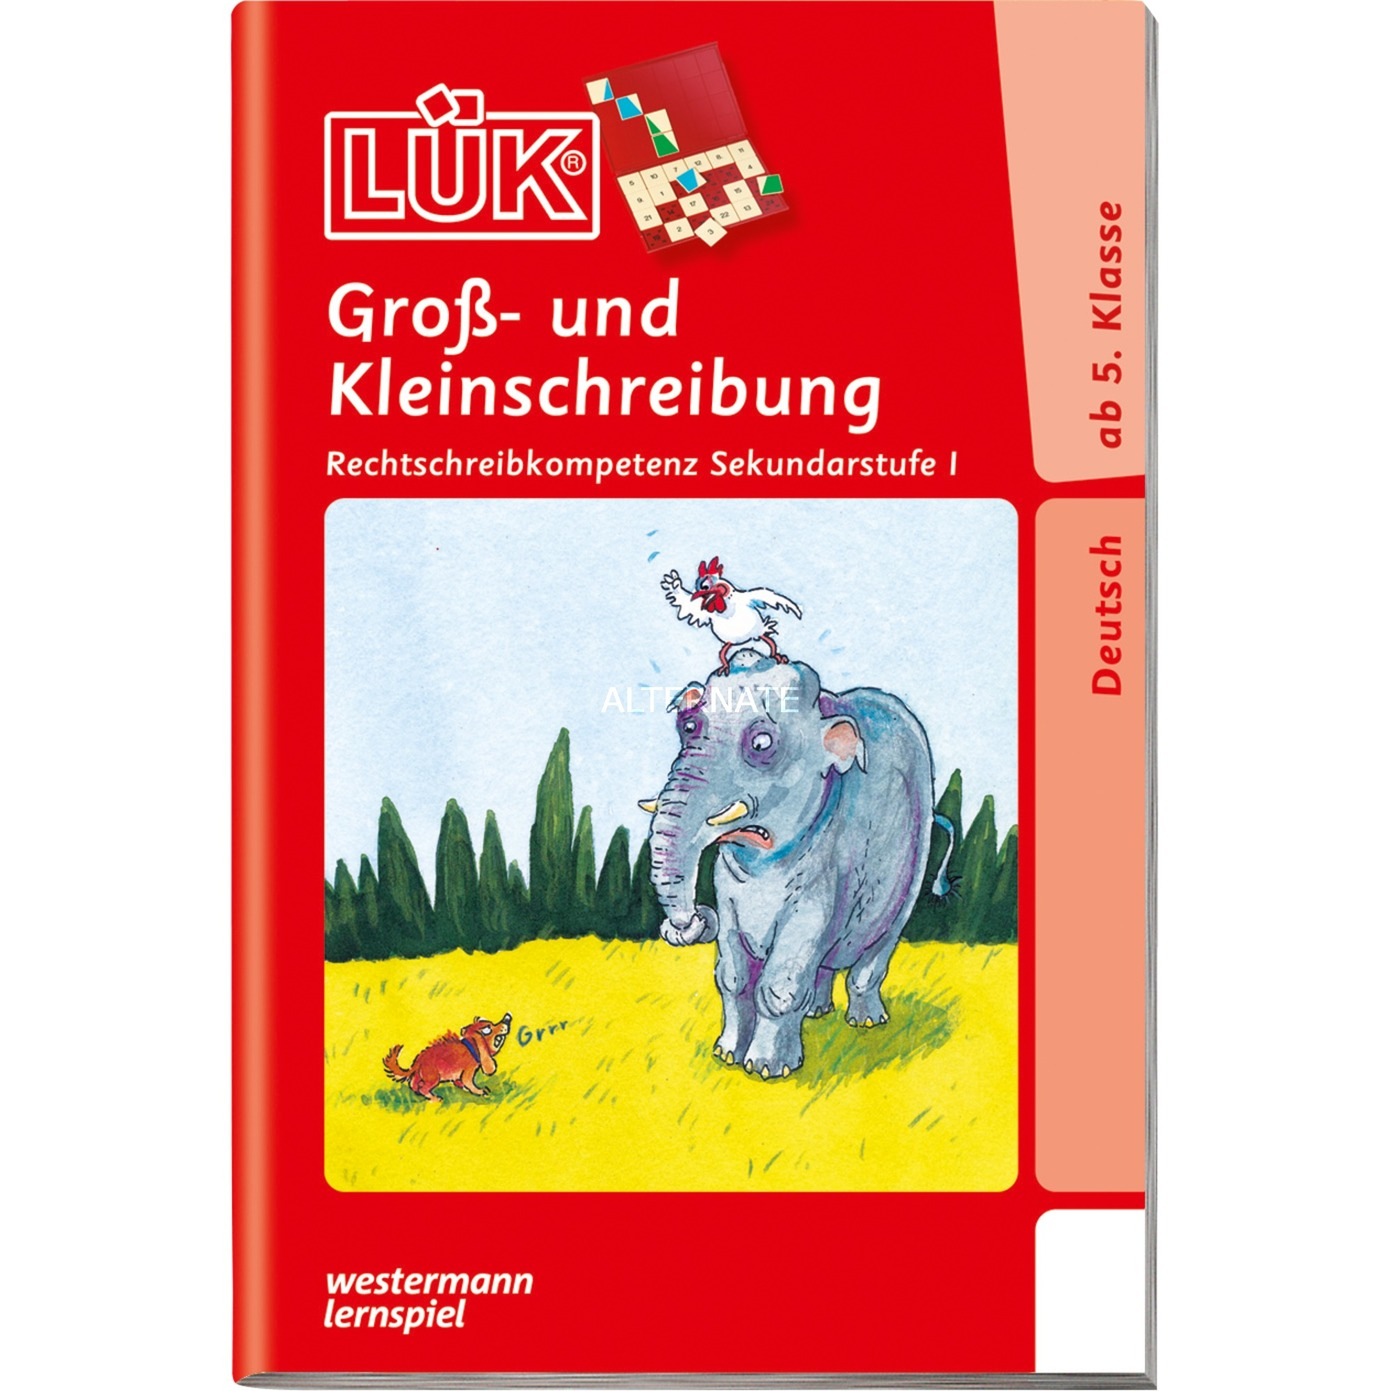 gross-und-kleinschreibung-ab-klasse-5-bornebog-bog-til-indlaring-skolebog